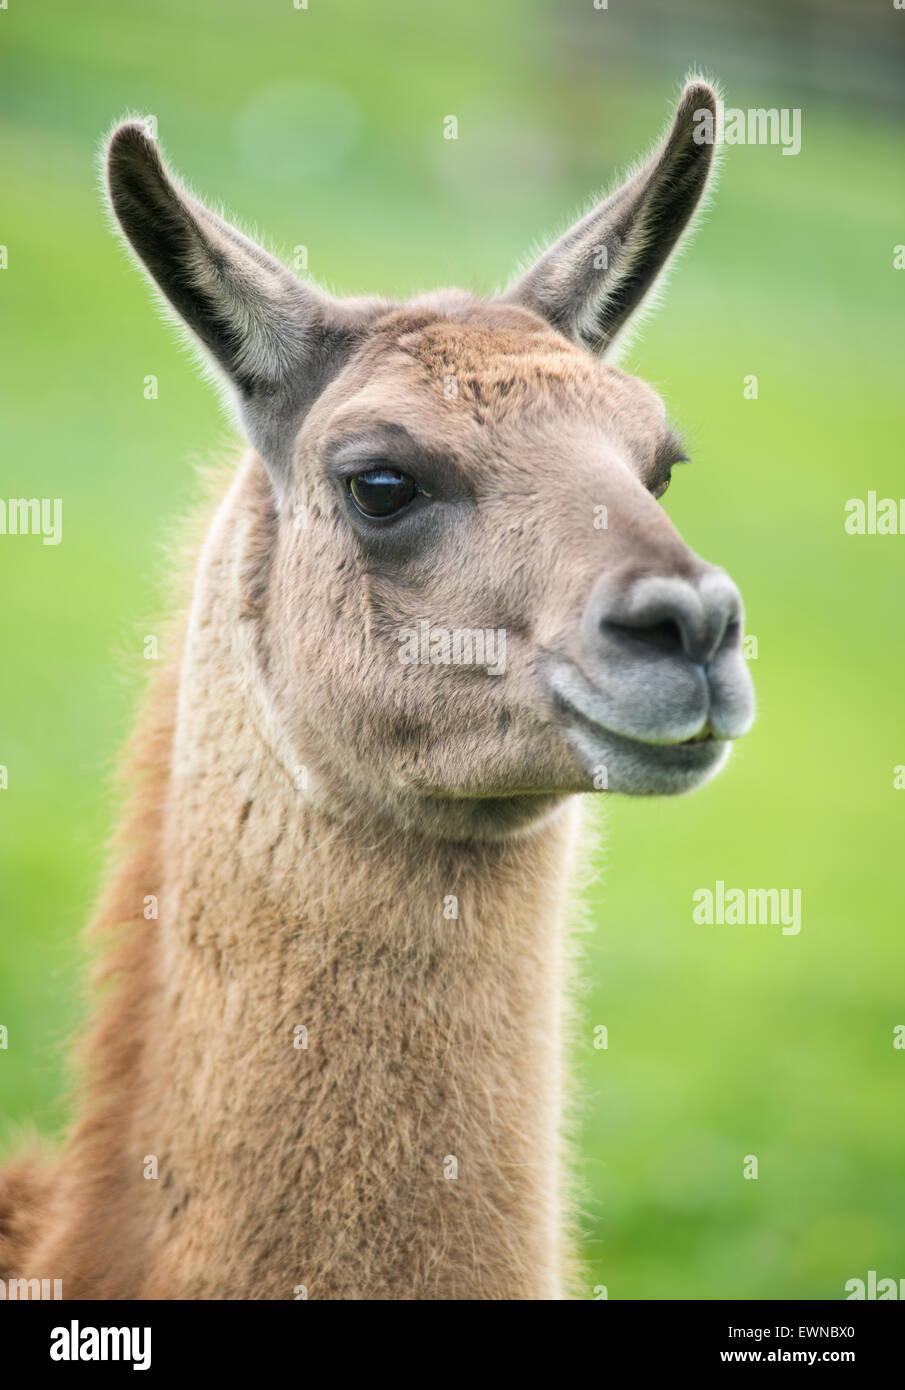 Portrait of a llama (Lama glama) - Stock Image